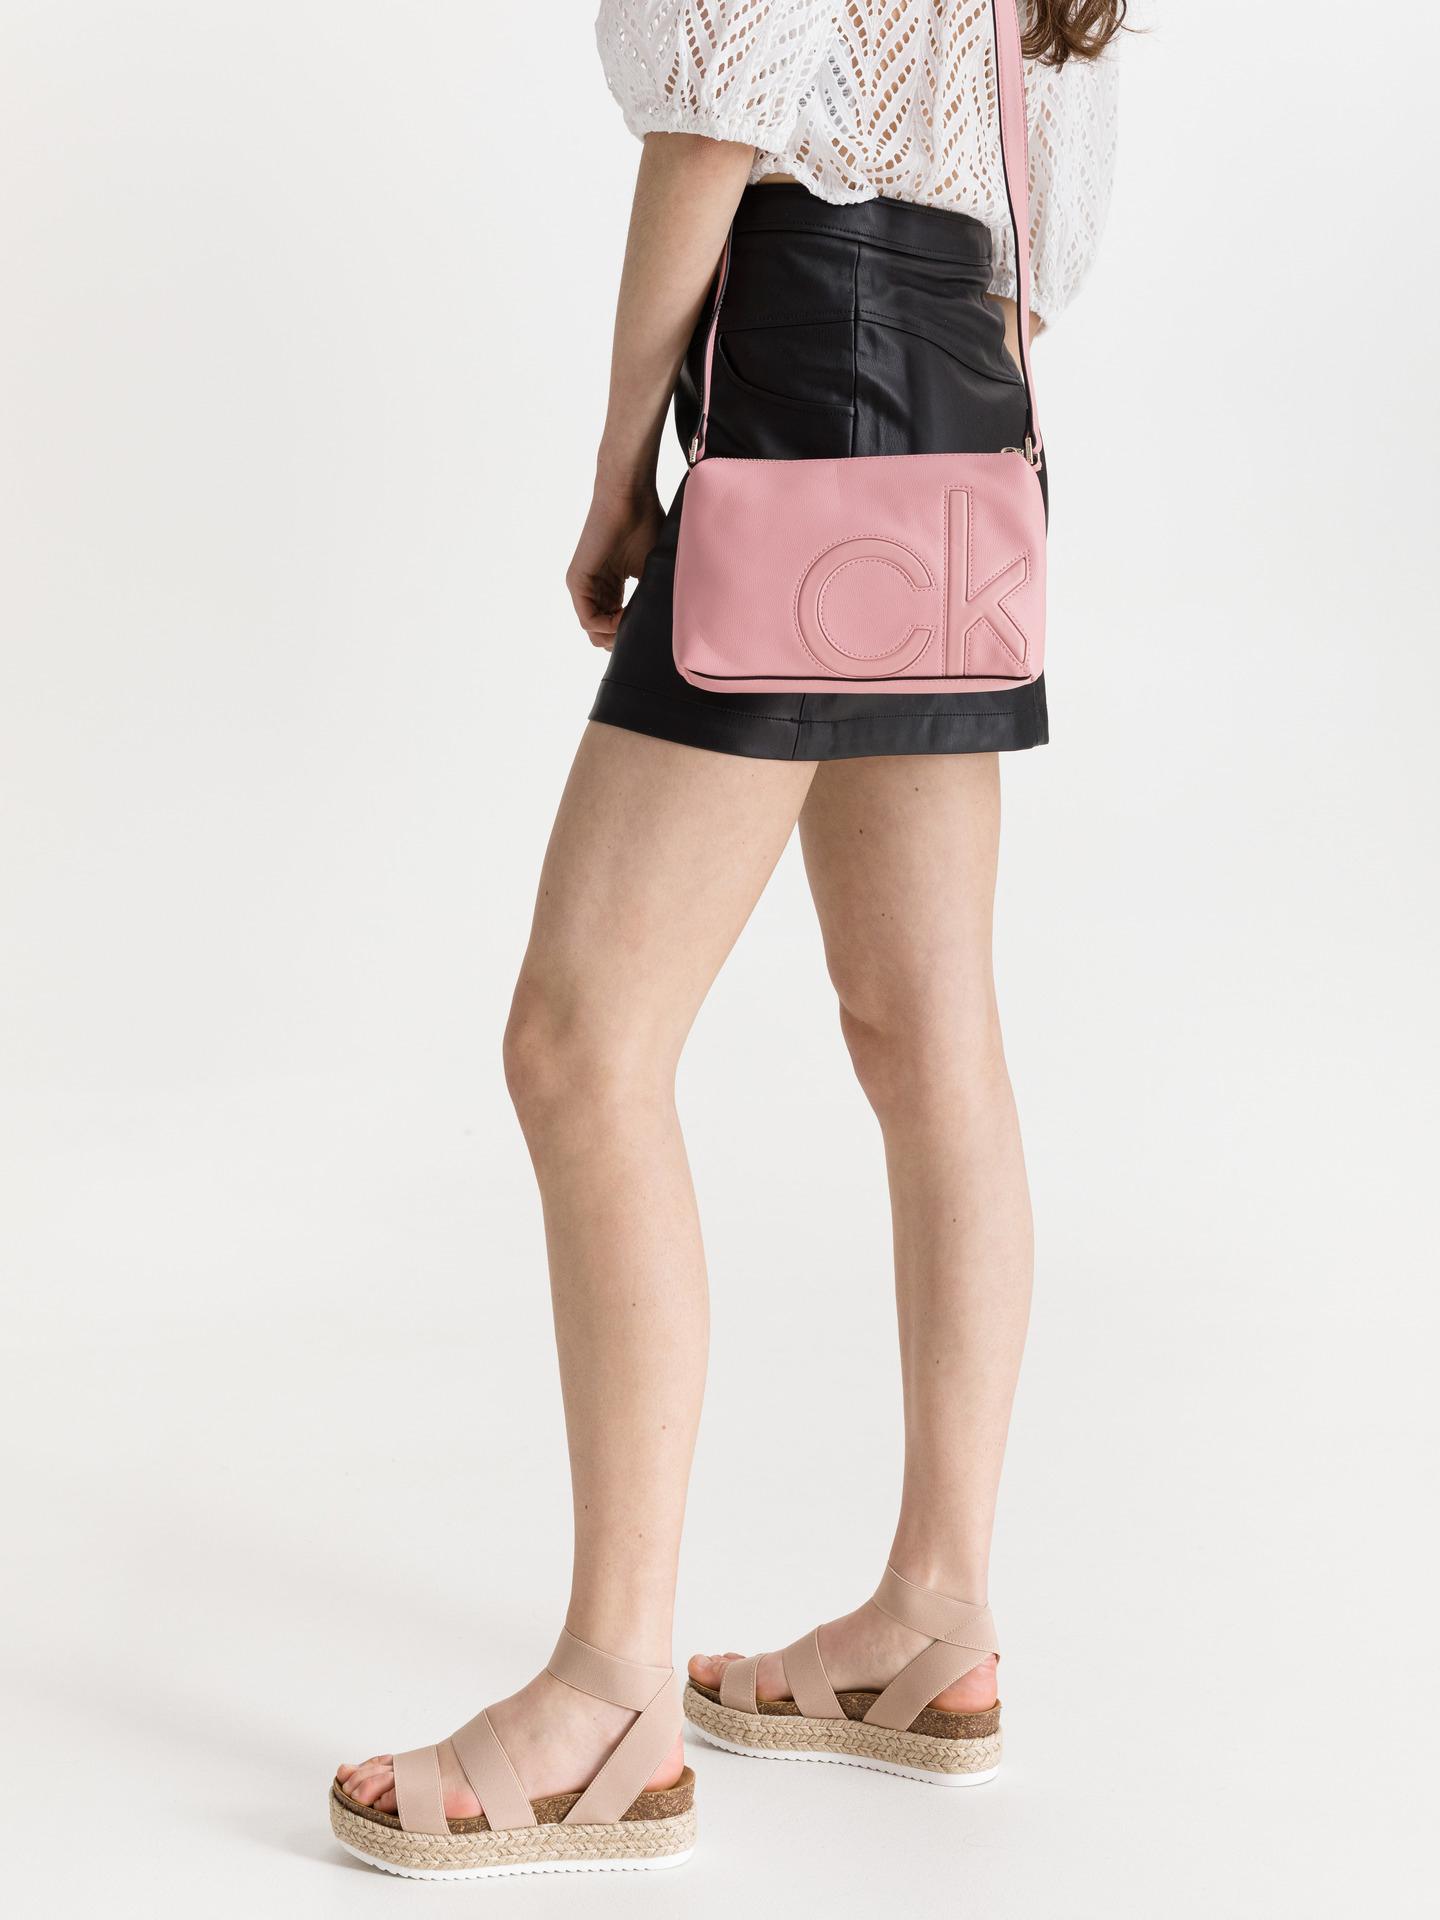 Calvin Klein pink crossbody bag